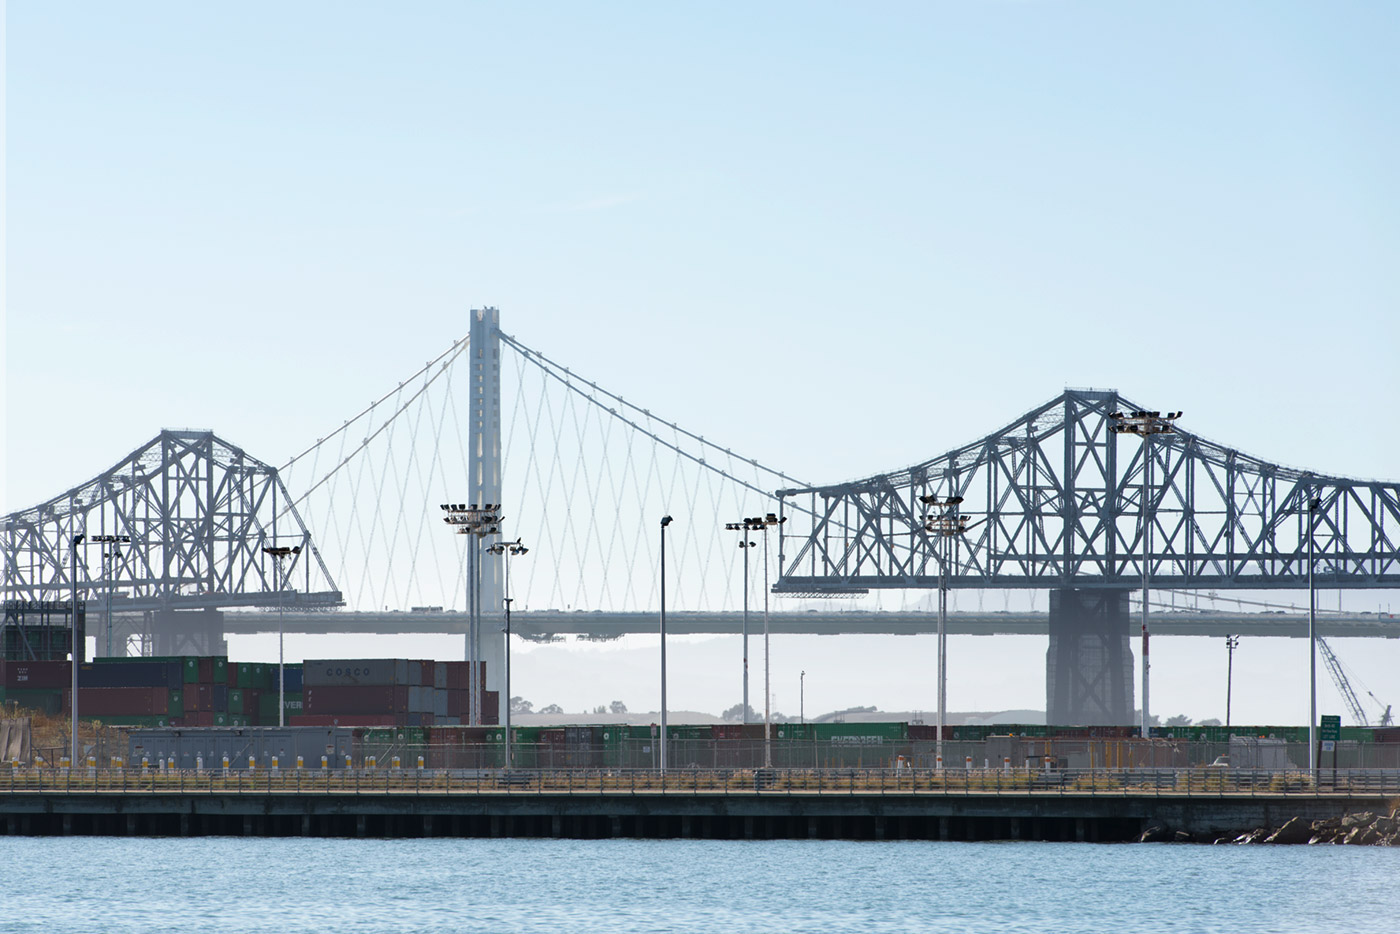 The San Francisco - Oakland Bay Bridges, Old and New